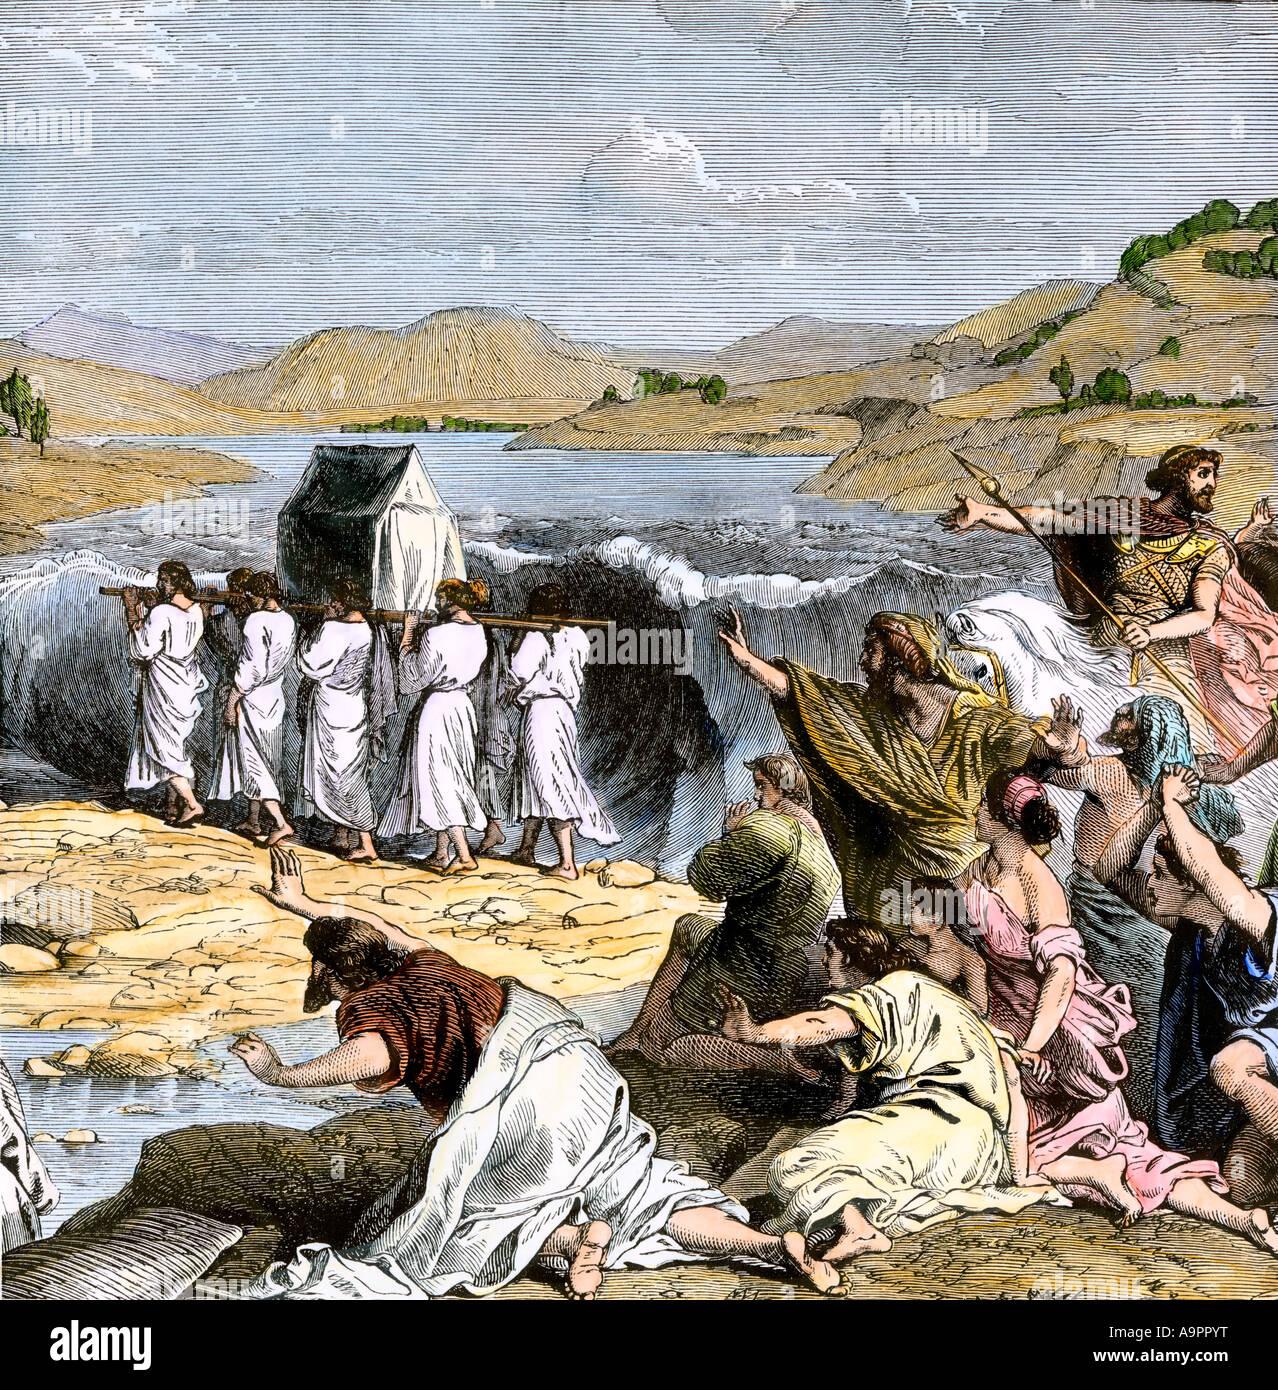 Ancient Palestine Painting